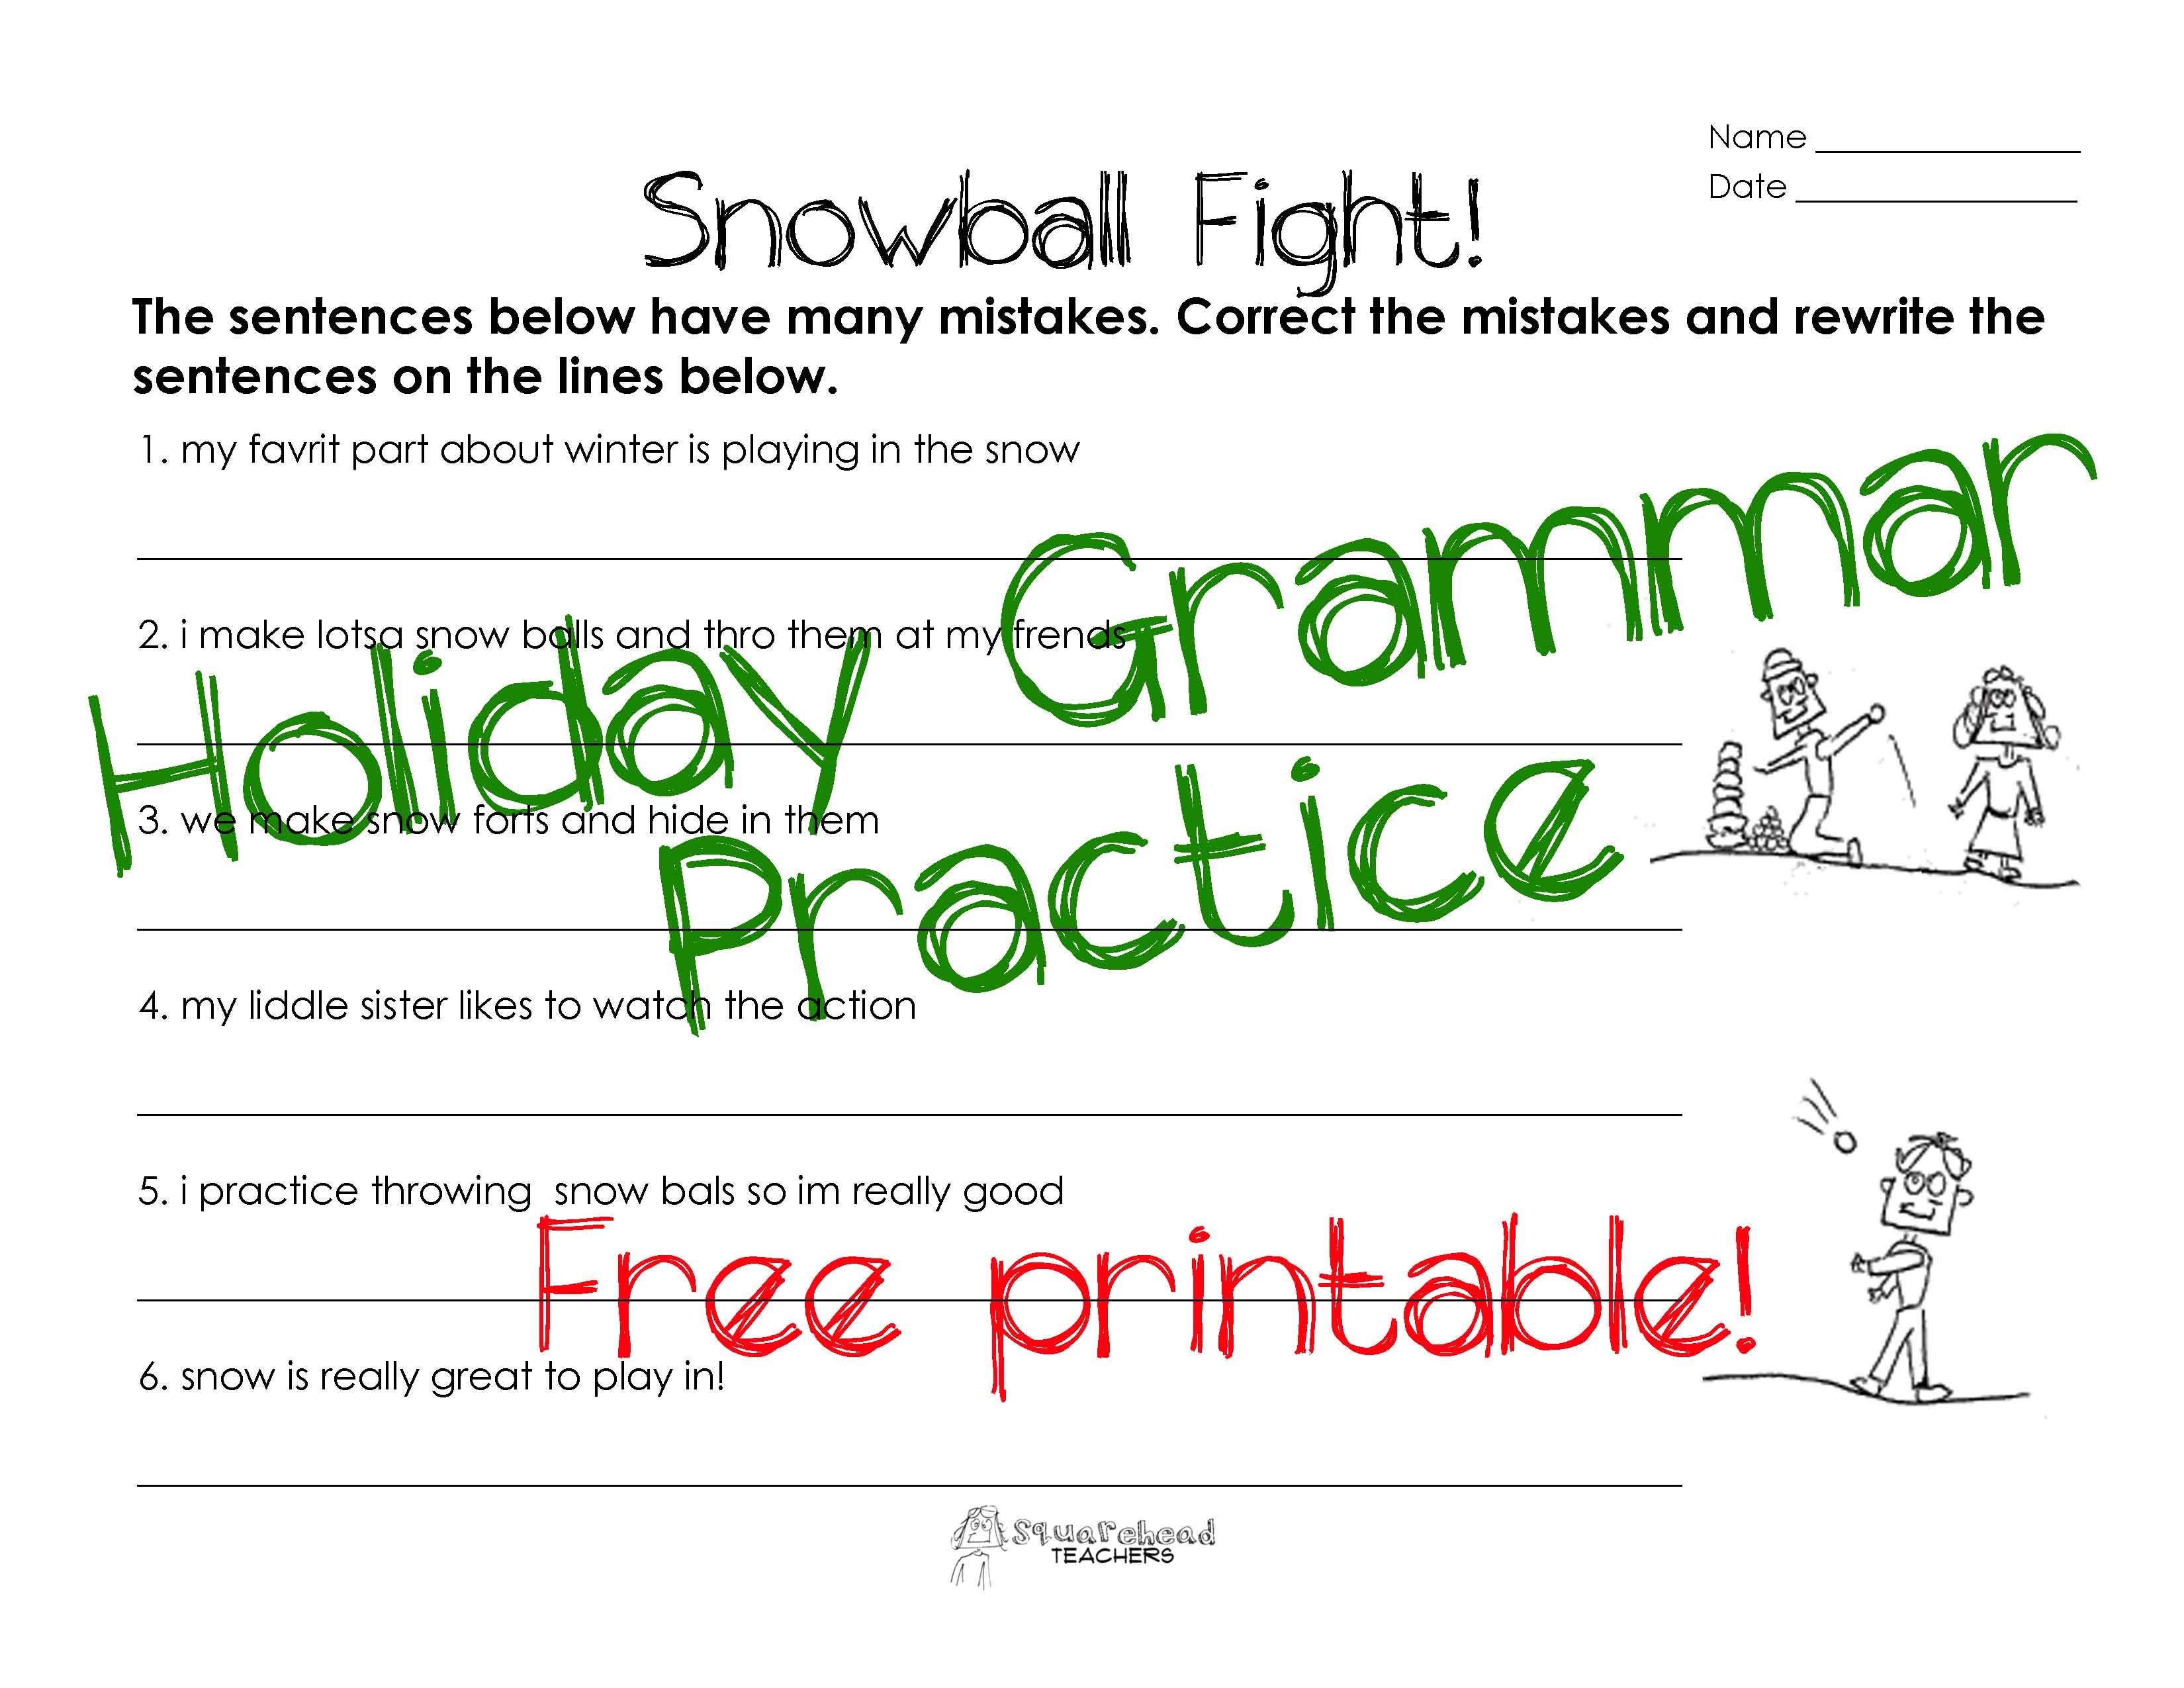 worksheet Christmas Grammar Worksheets snowball fight grammar worksheet squarehead teachers sticker